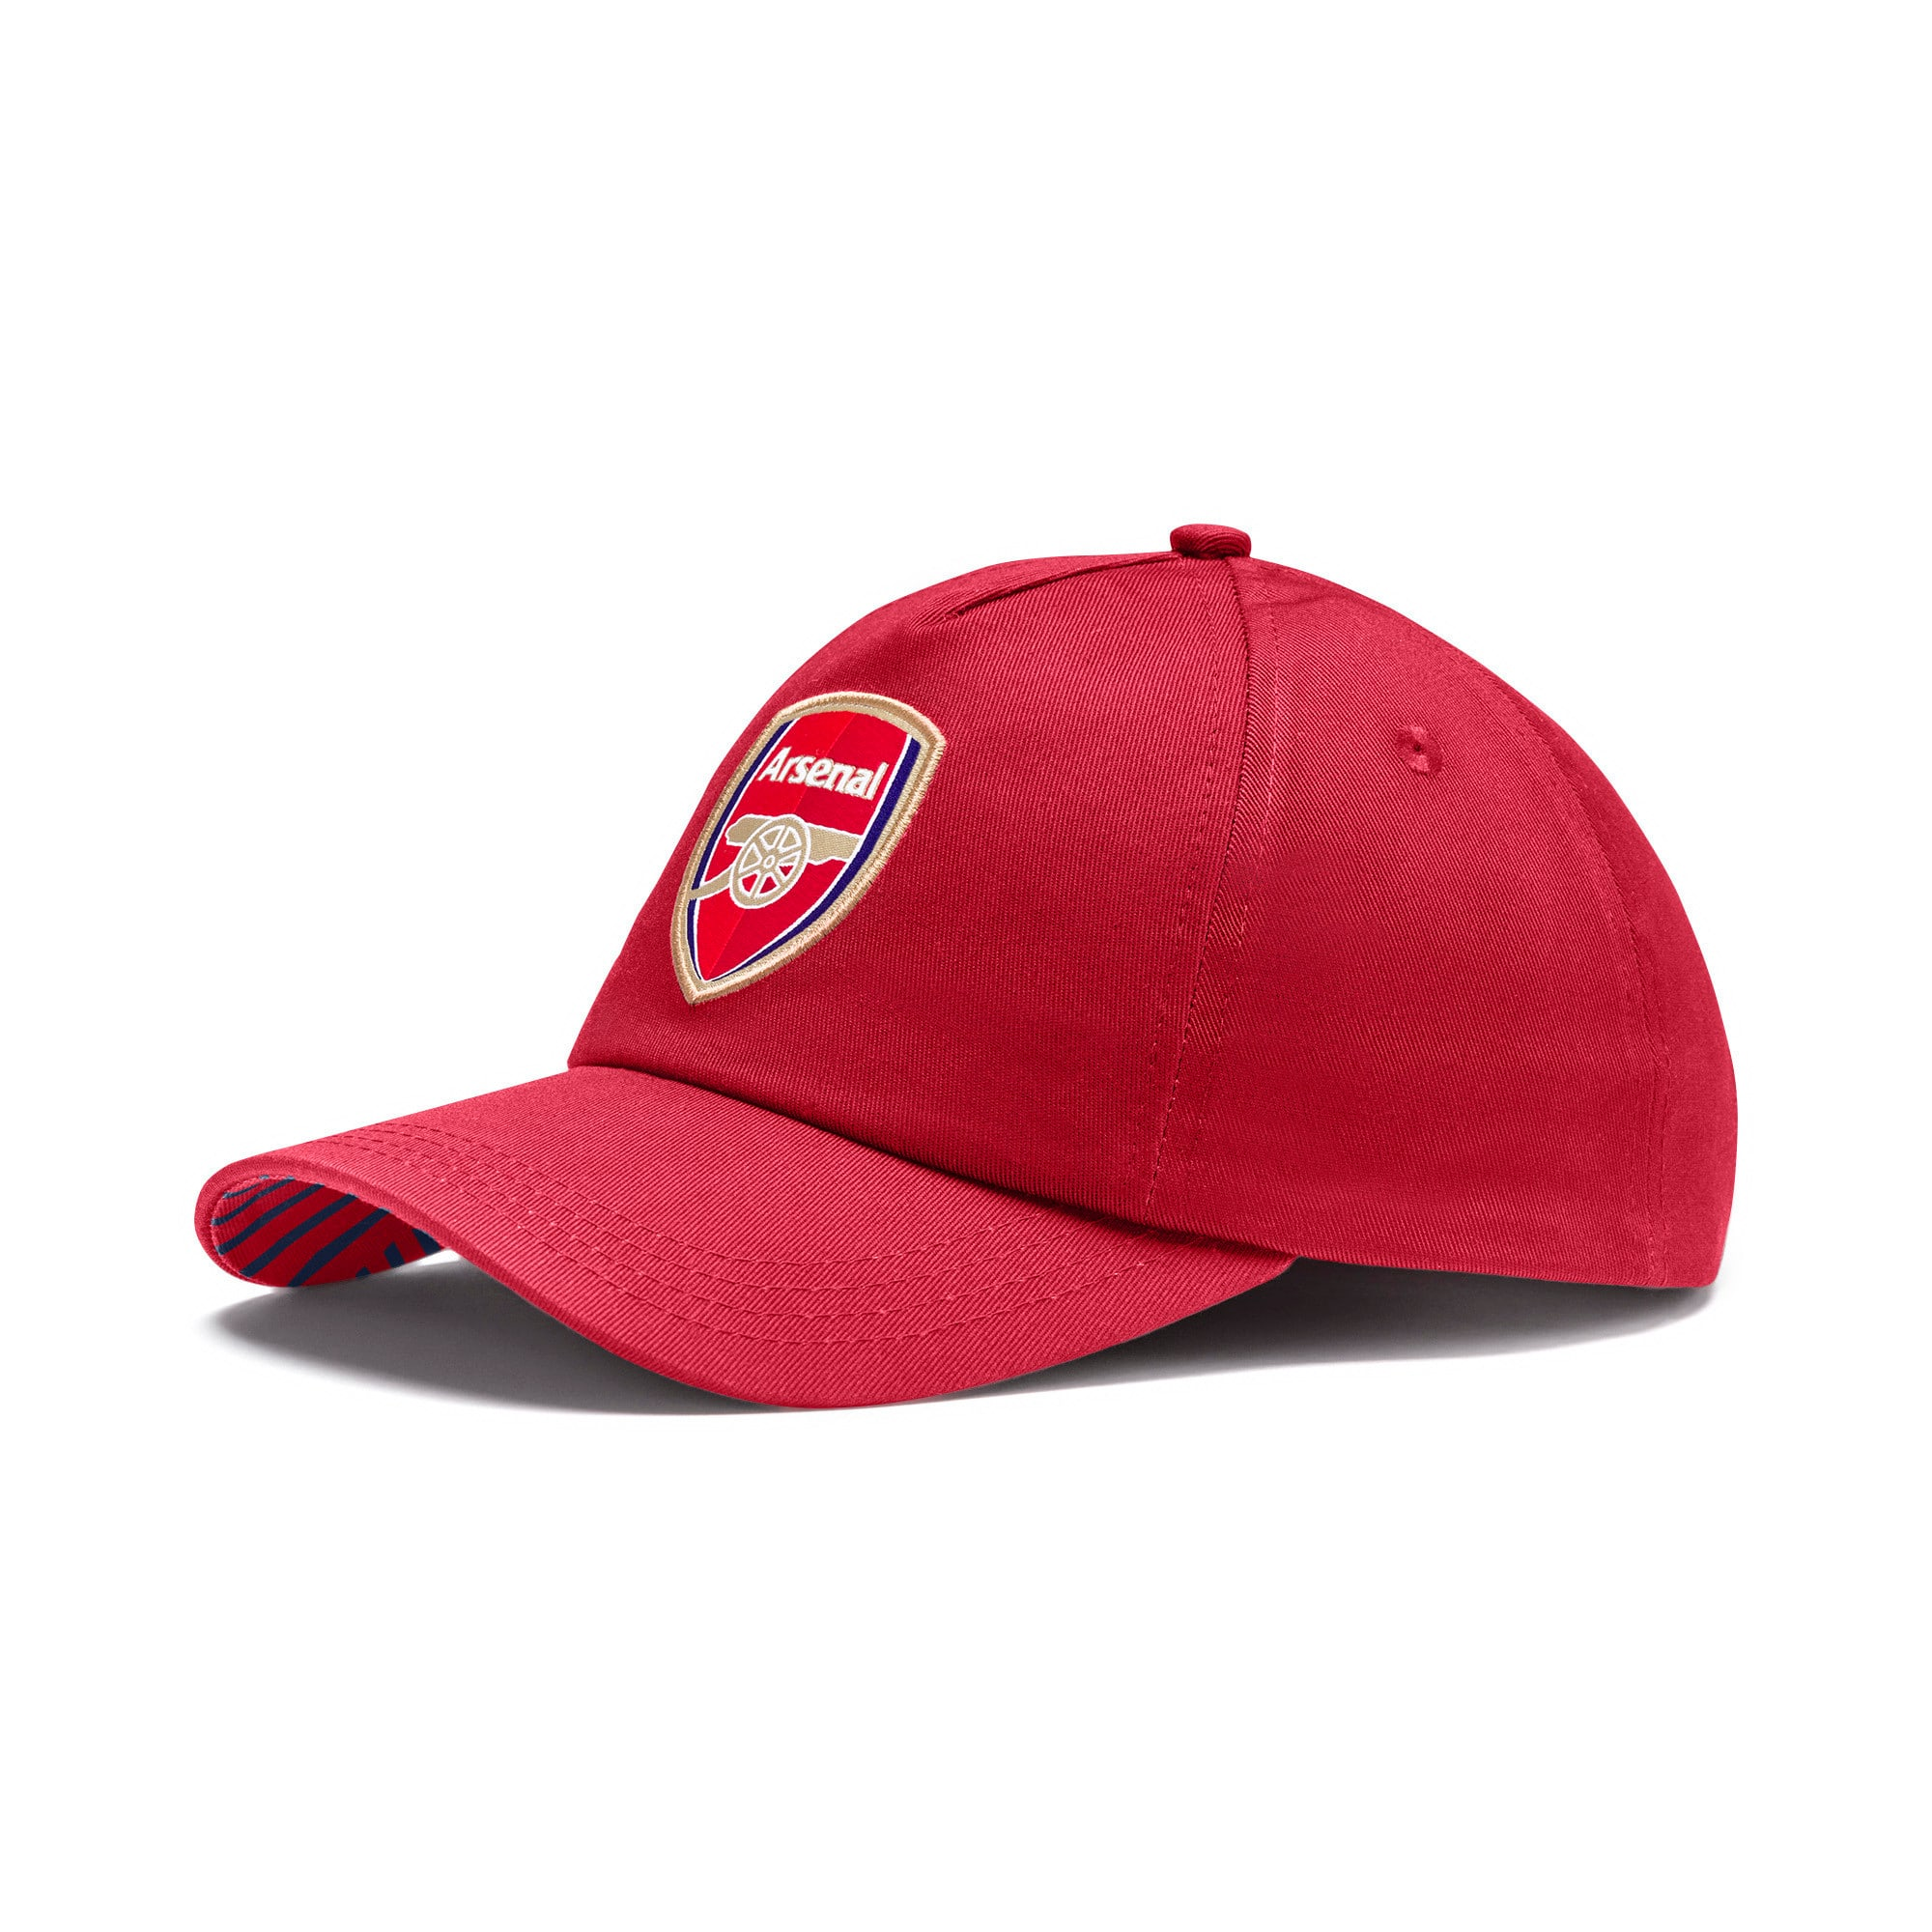 Thumbnail 1 of AFC Training Hat, Pomegranate-Peacoat, medium